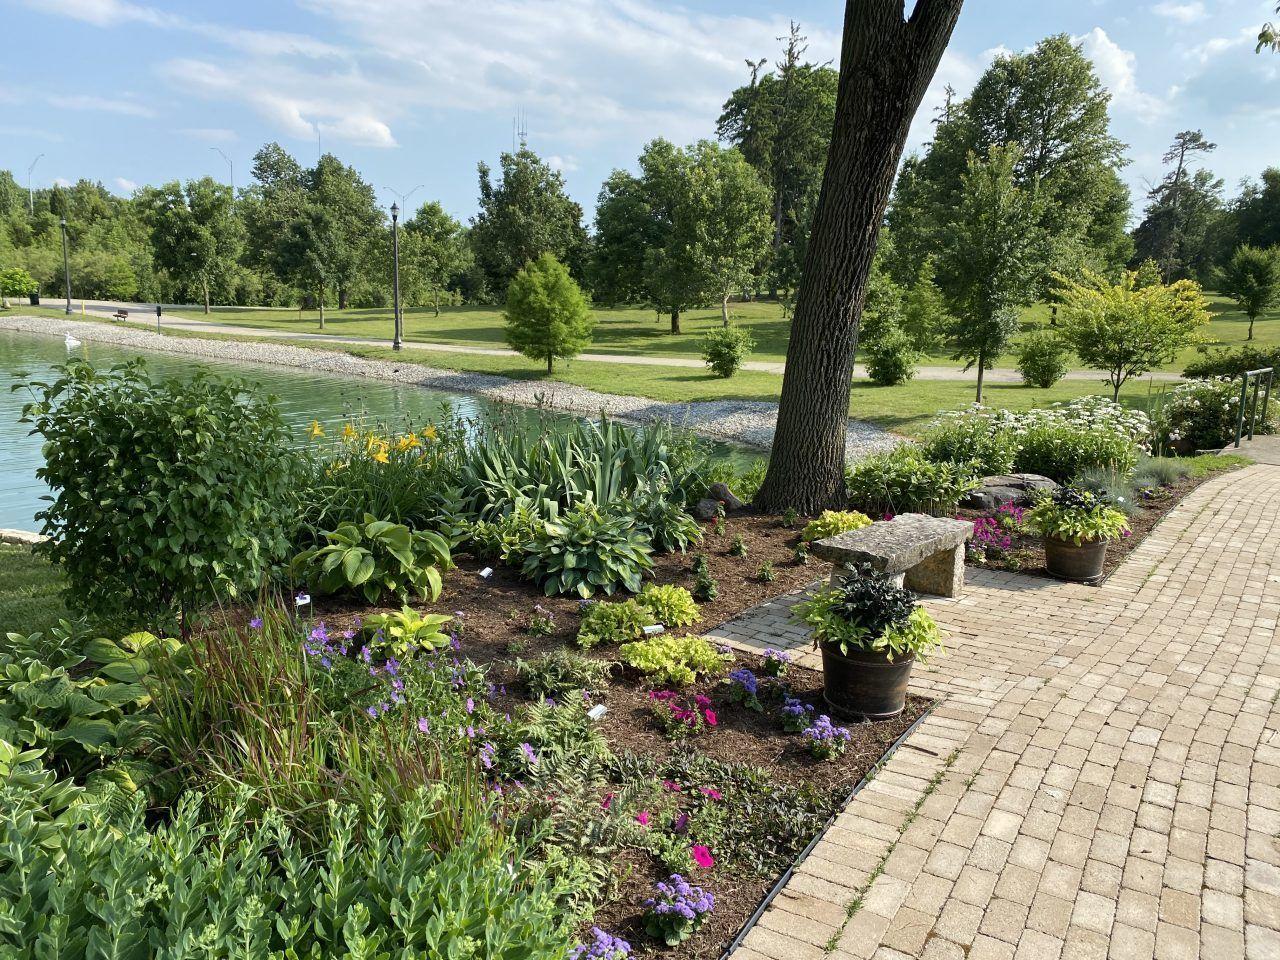 8. Lt. William Putnam Memorial Garden